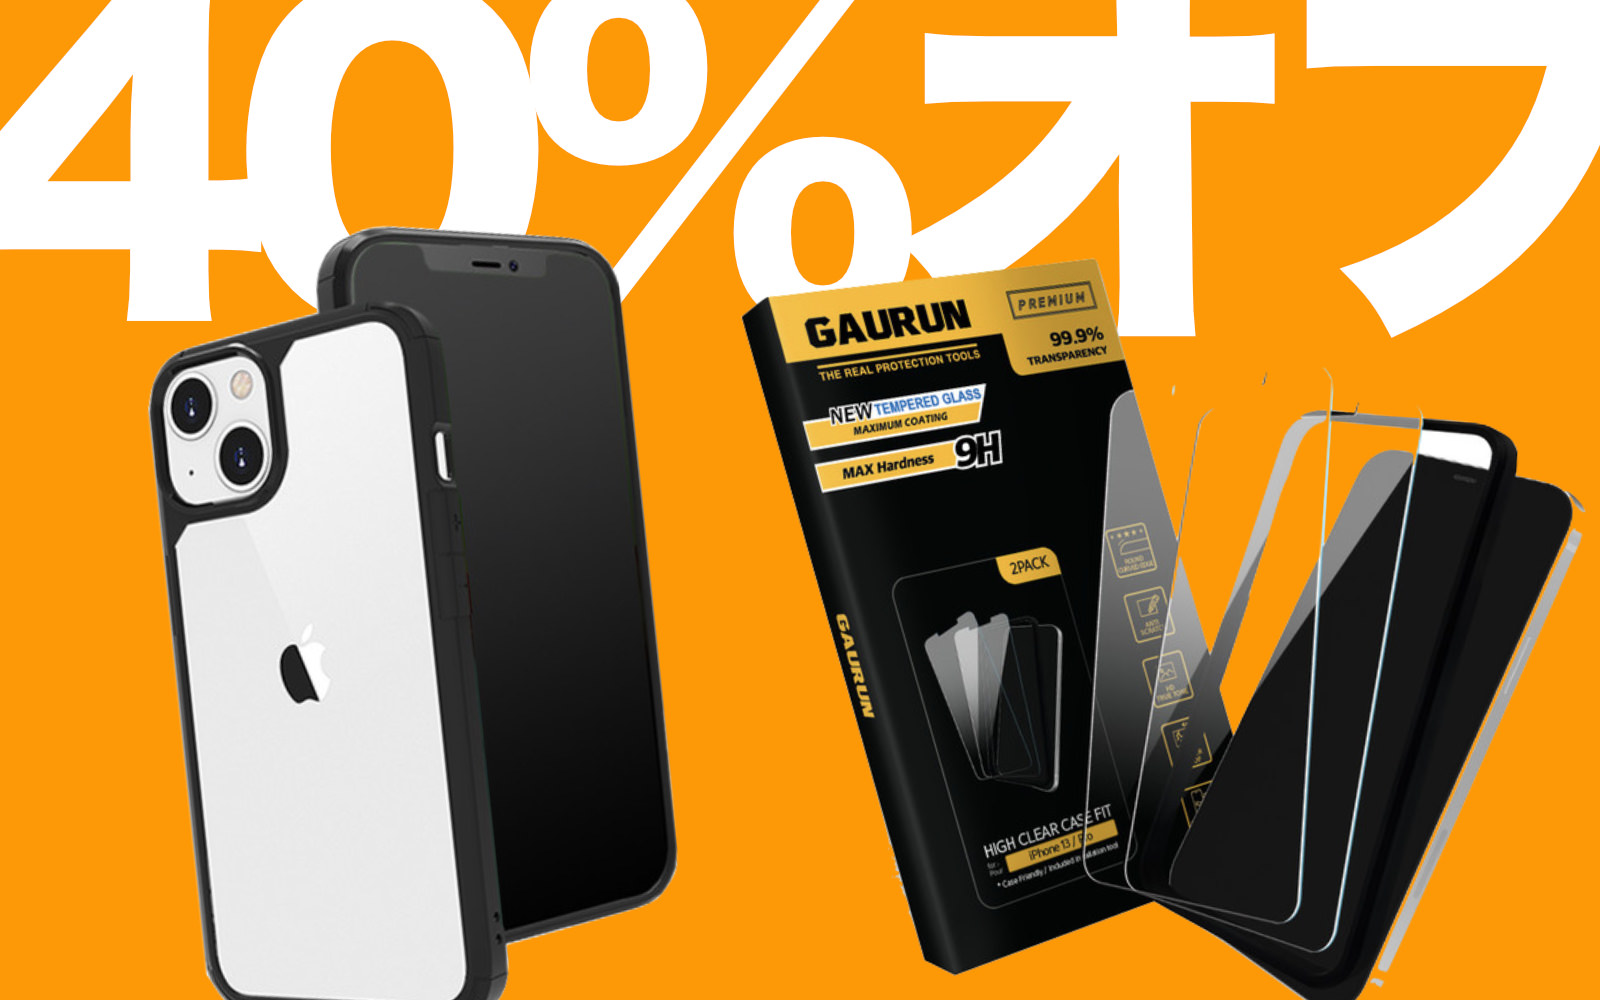 GAURUN 40percent off sale